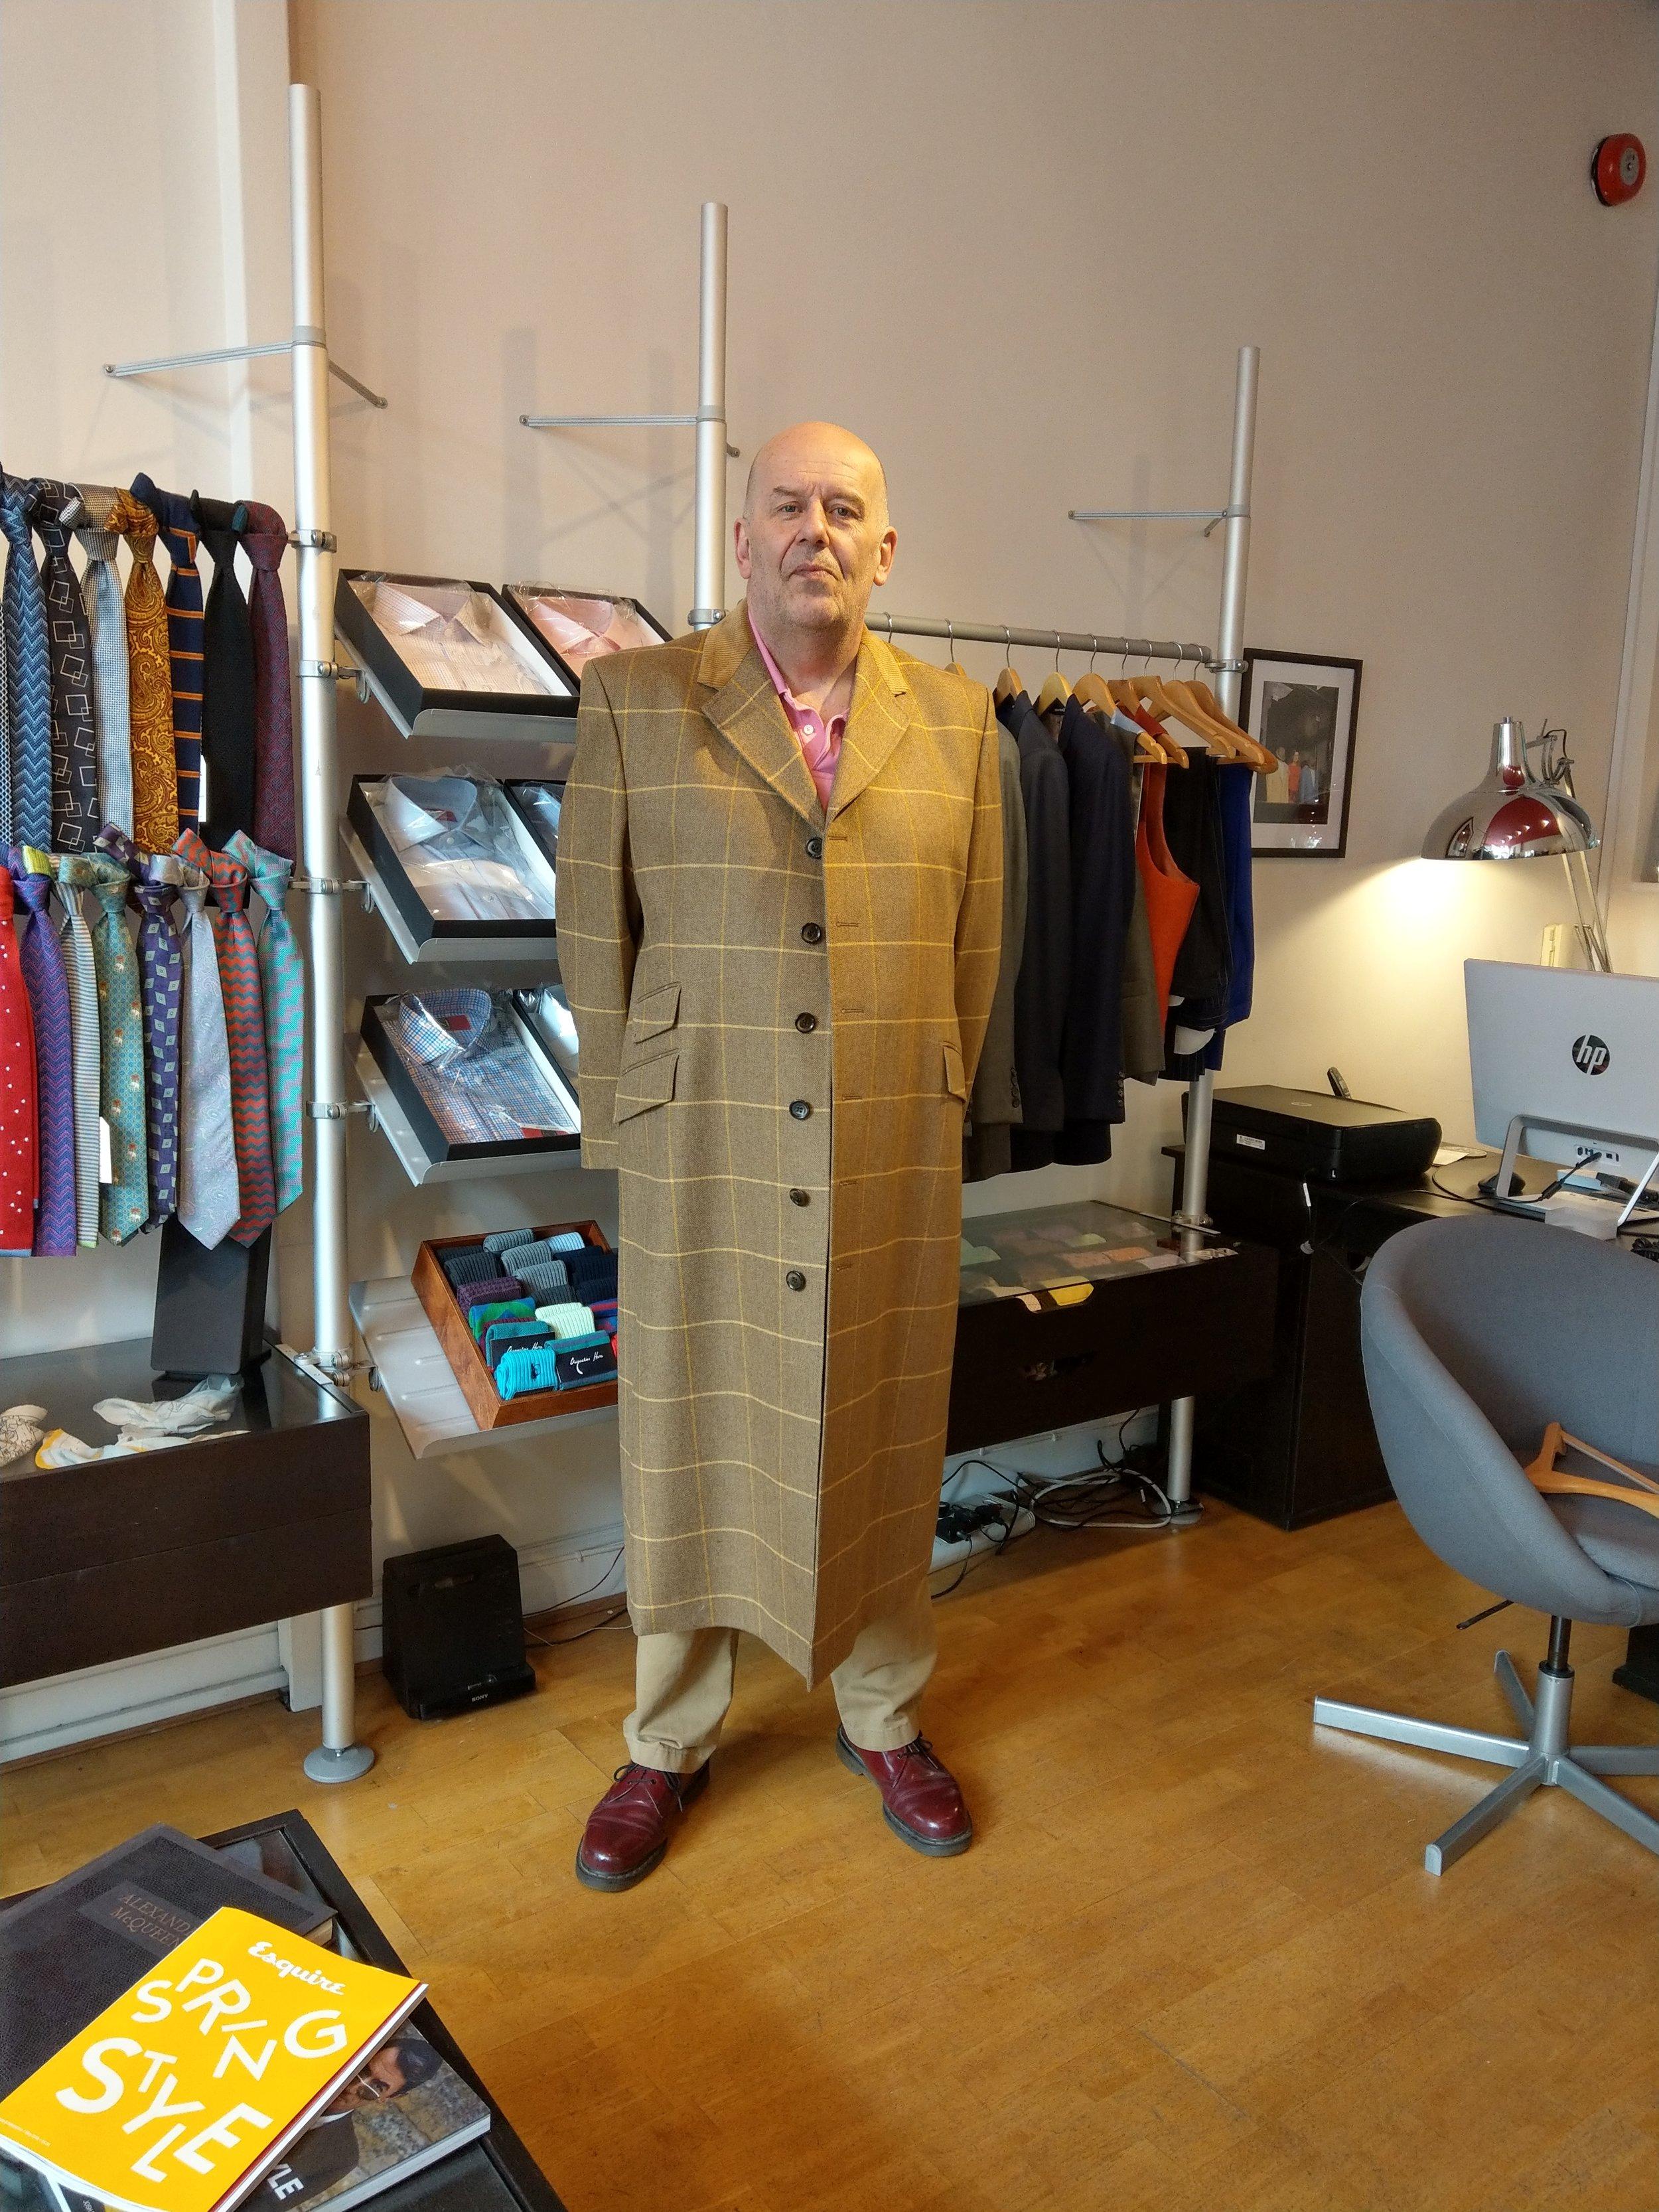 johnstons-elgin-tweed-bespoke-coat-tailor-susannah-hall-made-england-uk-britain.jpg